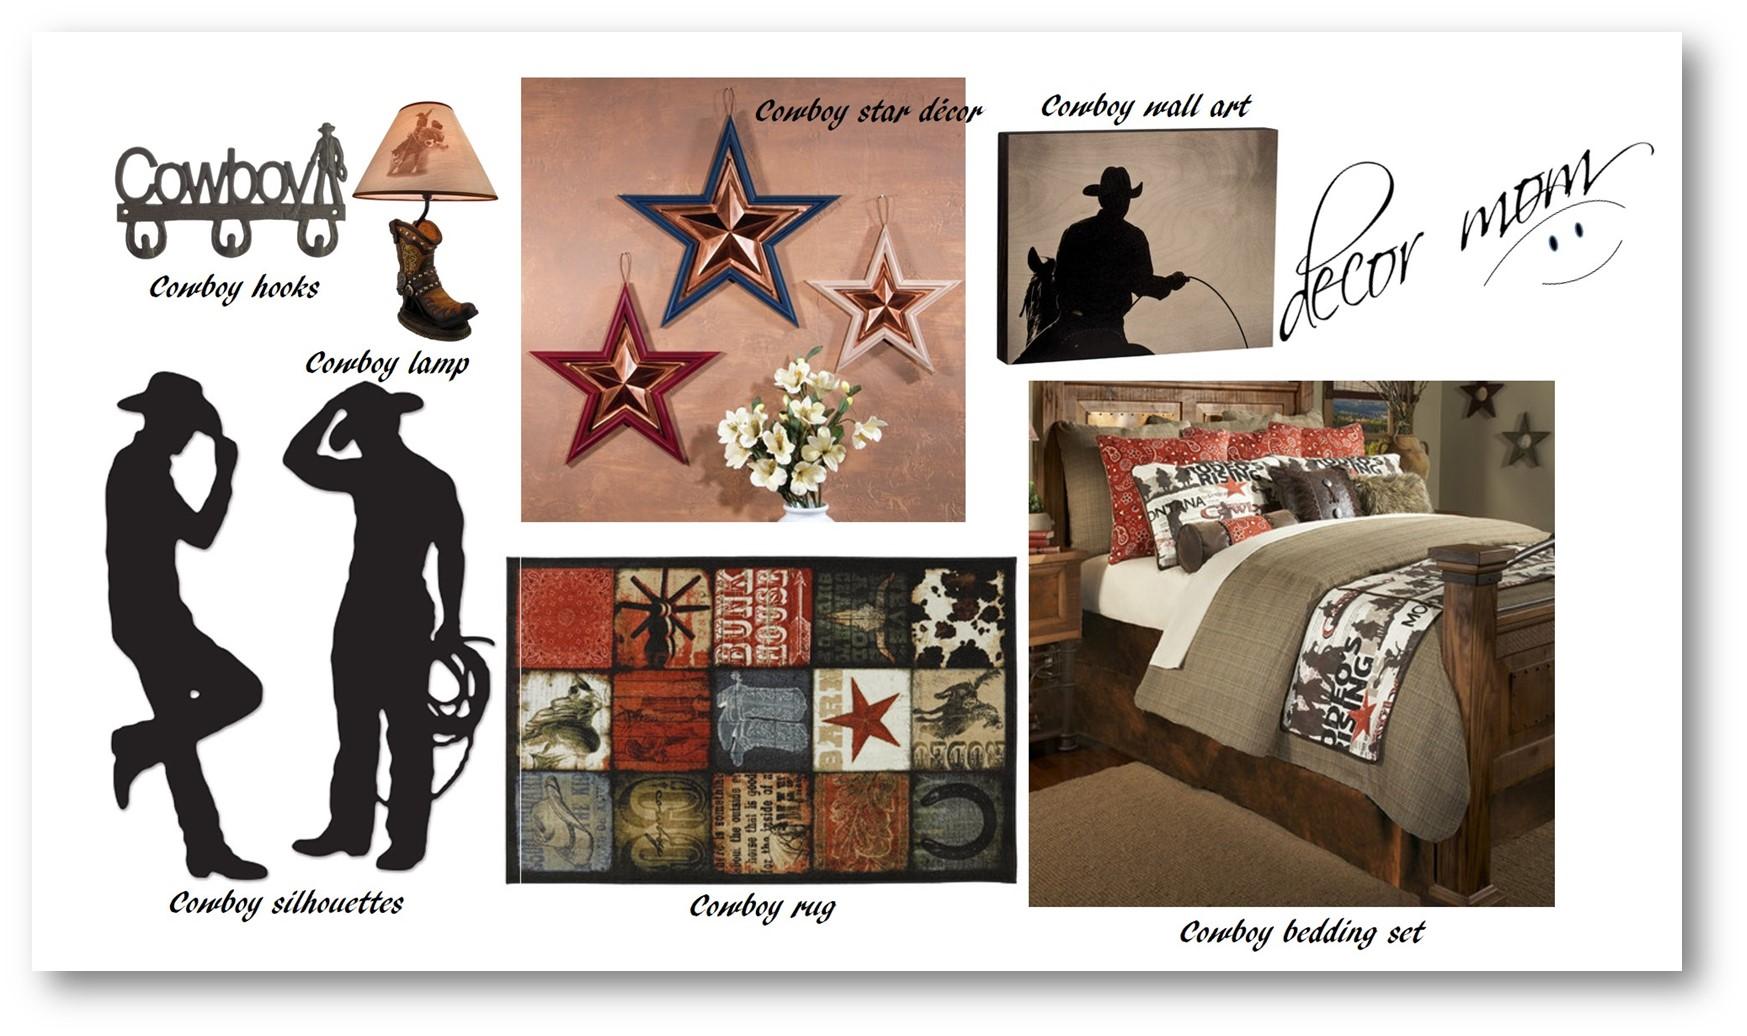 Vision Board 2 - Cowboy Teen Room